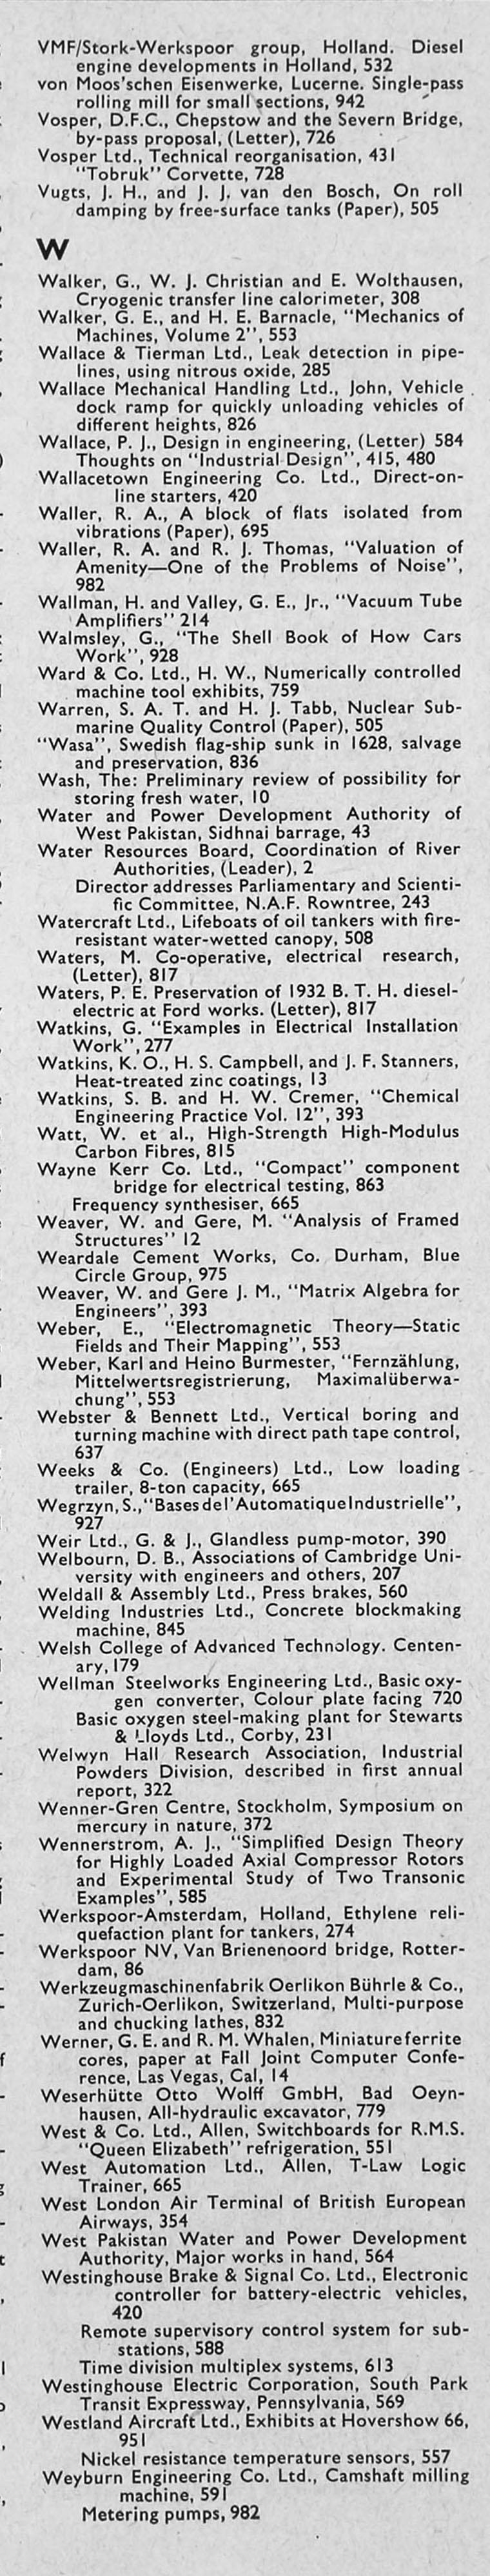 The Engineer 1966 Jan Jun Index